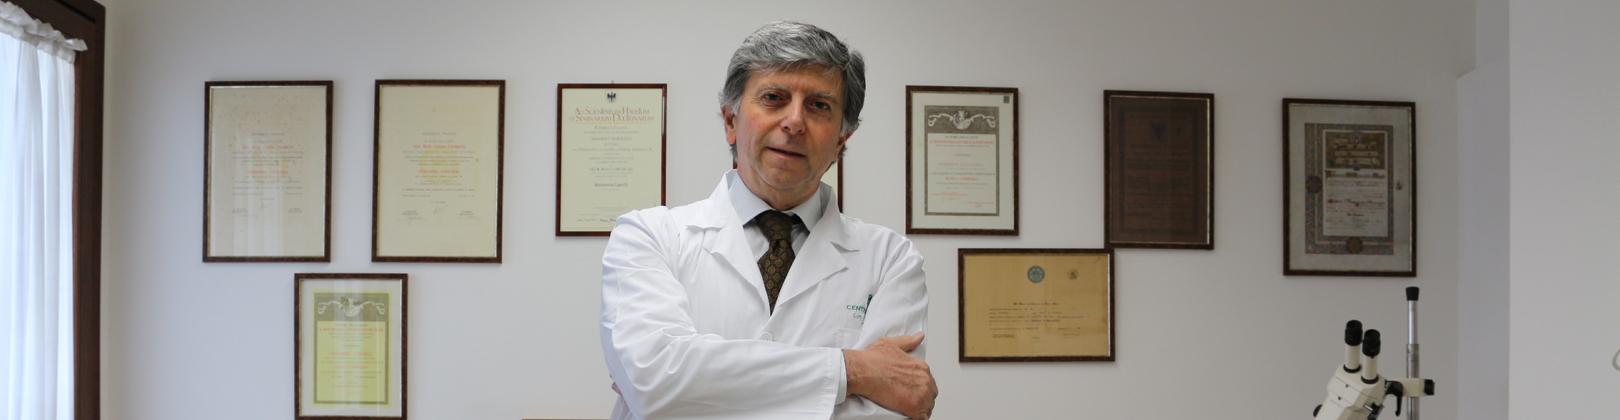 Dott. Vincenzo Cantelli